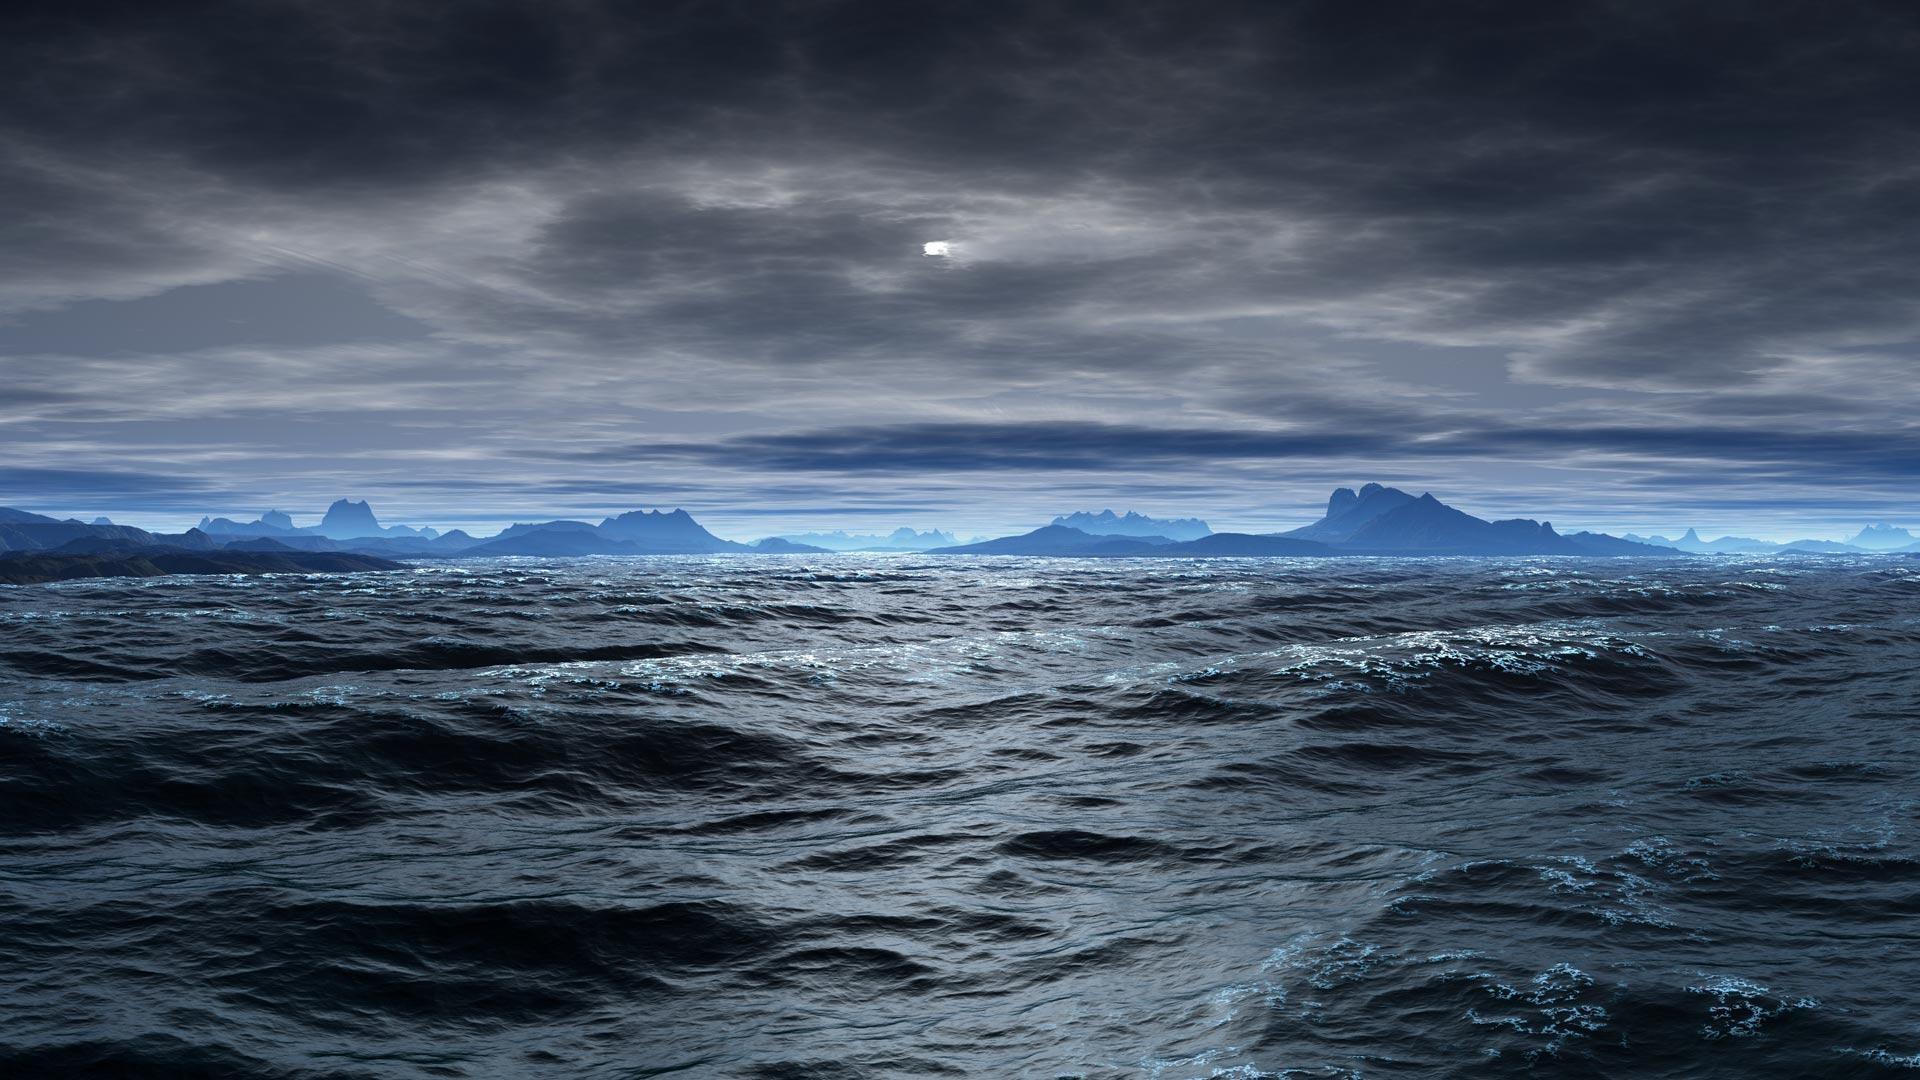 Ocean Desktop Wallpapers – HD Wallpapers Inn